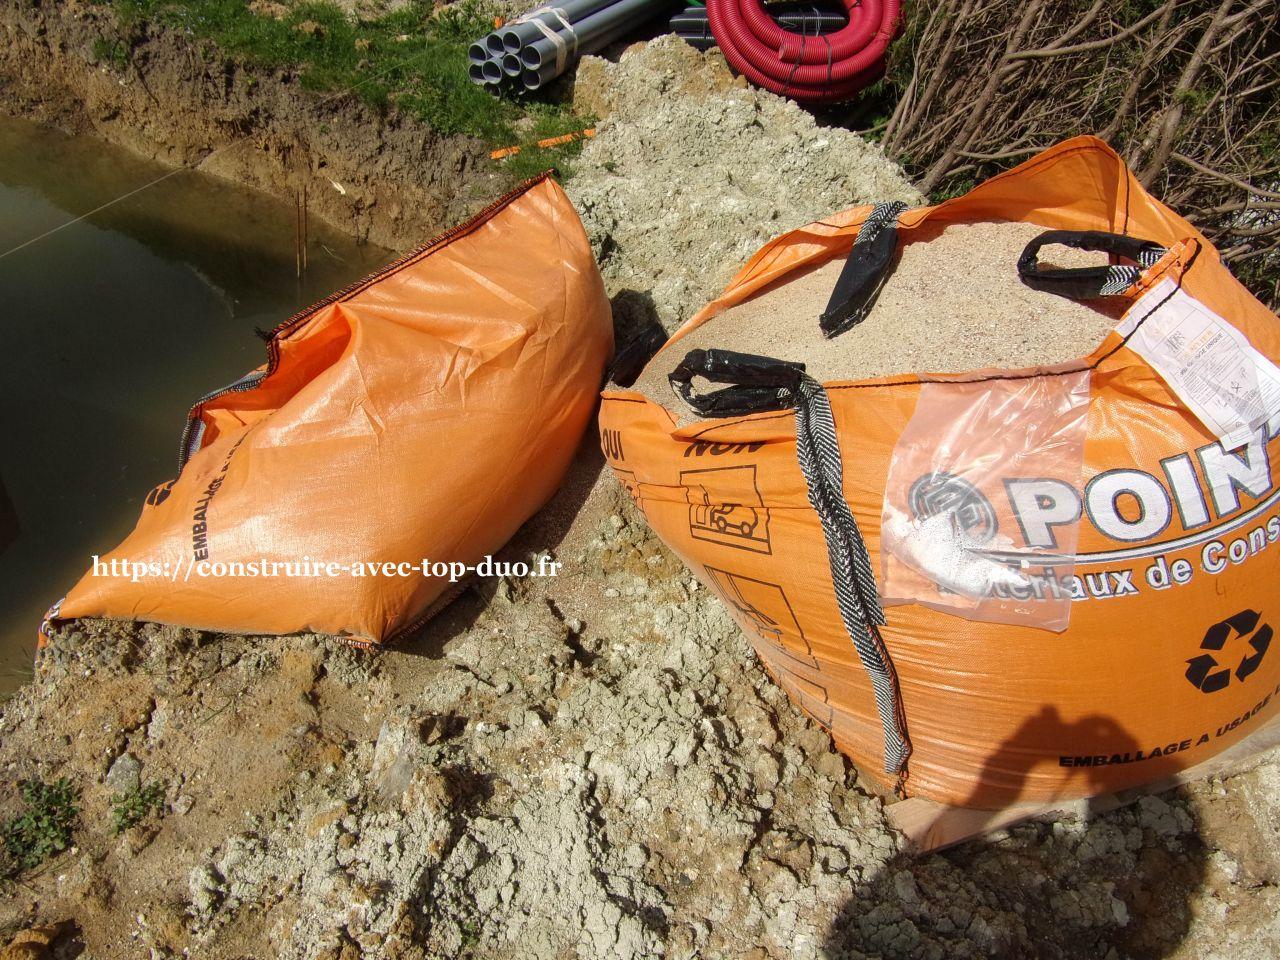 Chantier TOP DUO AST sac de sable renversé